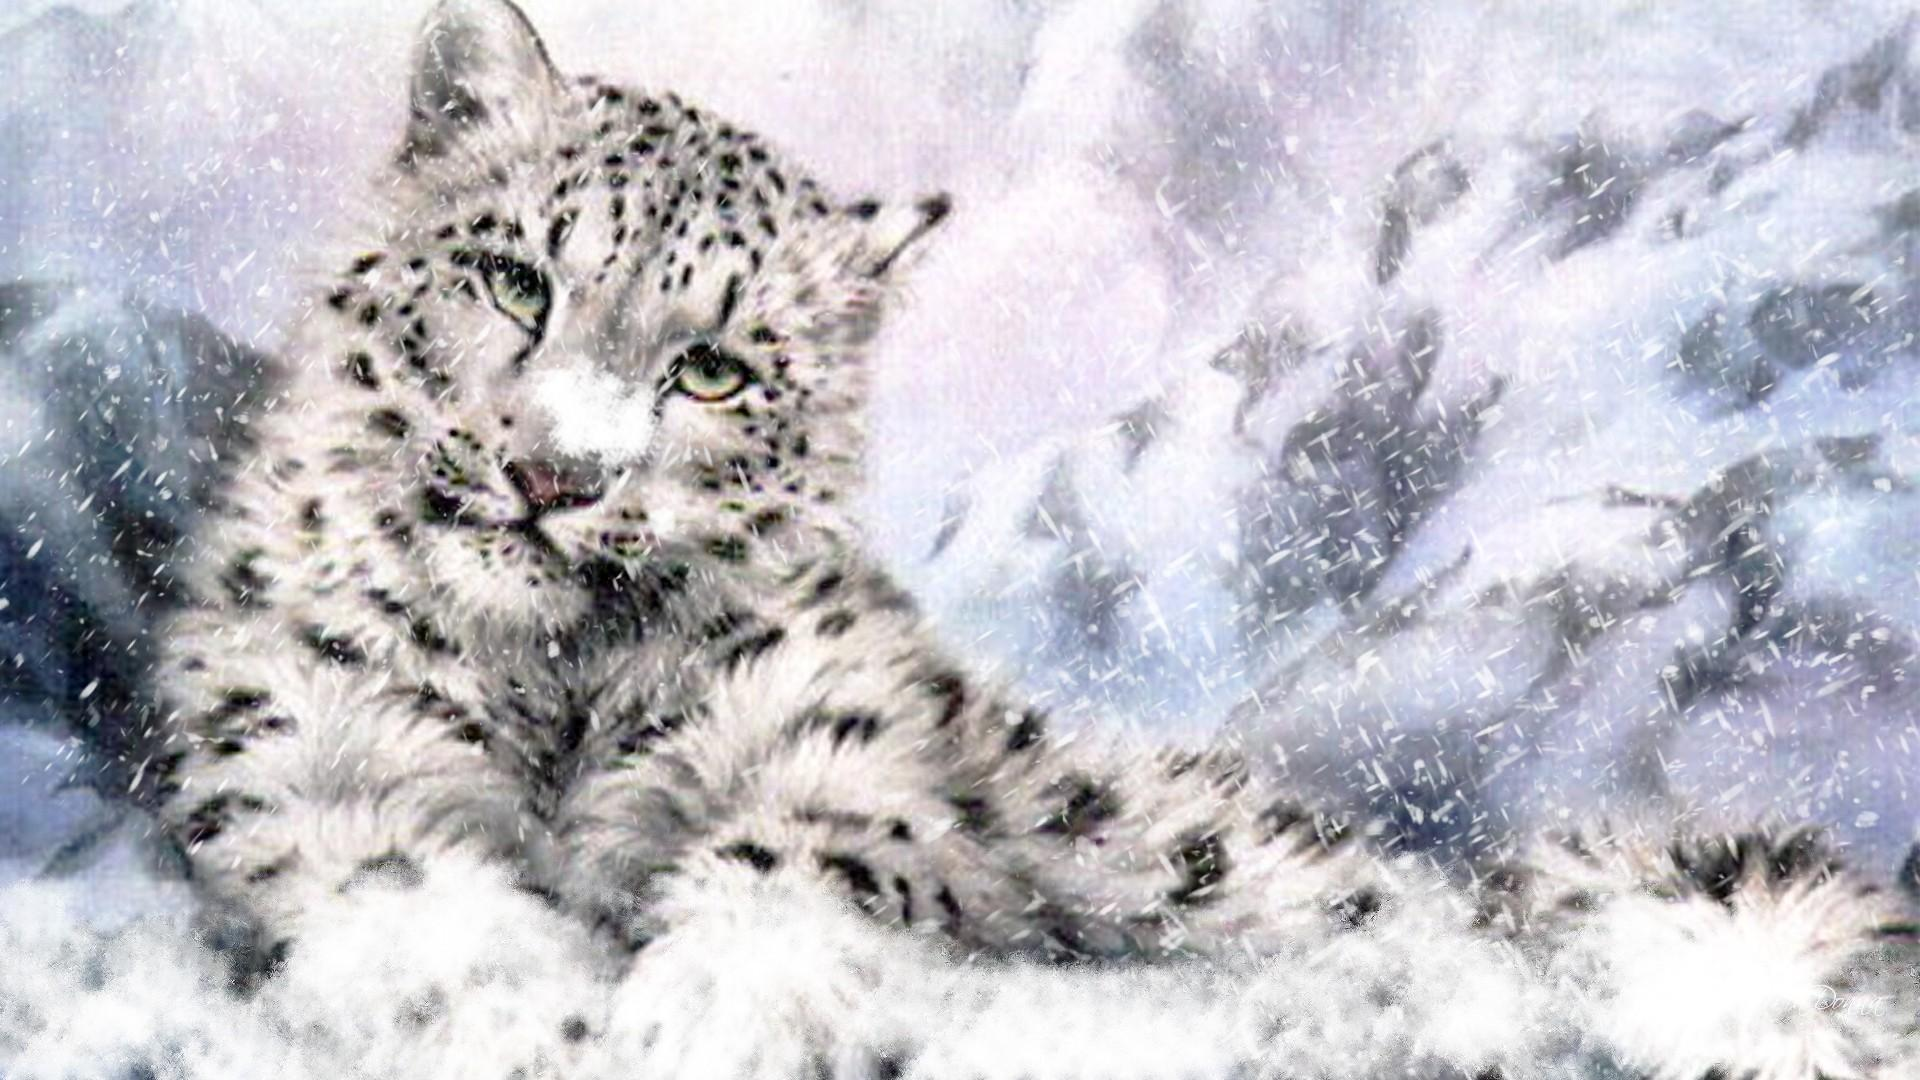 Snow Leopard Wallpapers HD - Wallpaper Cave